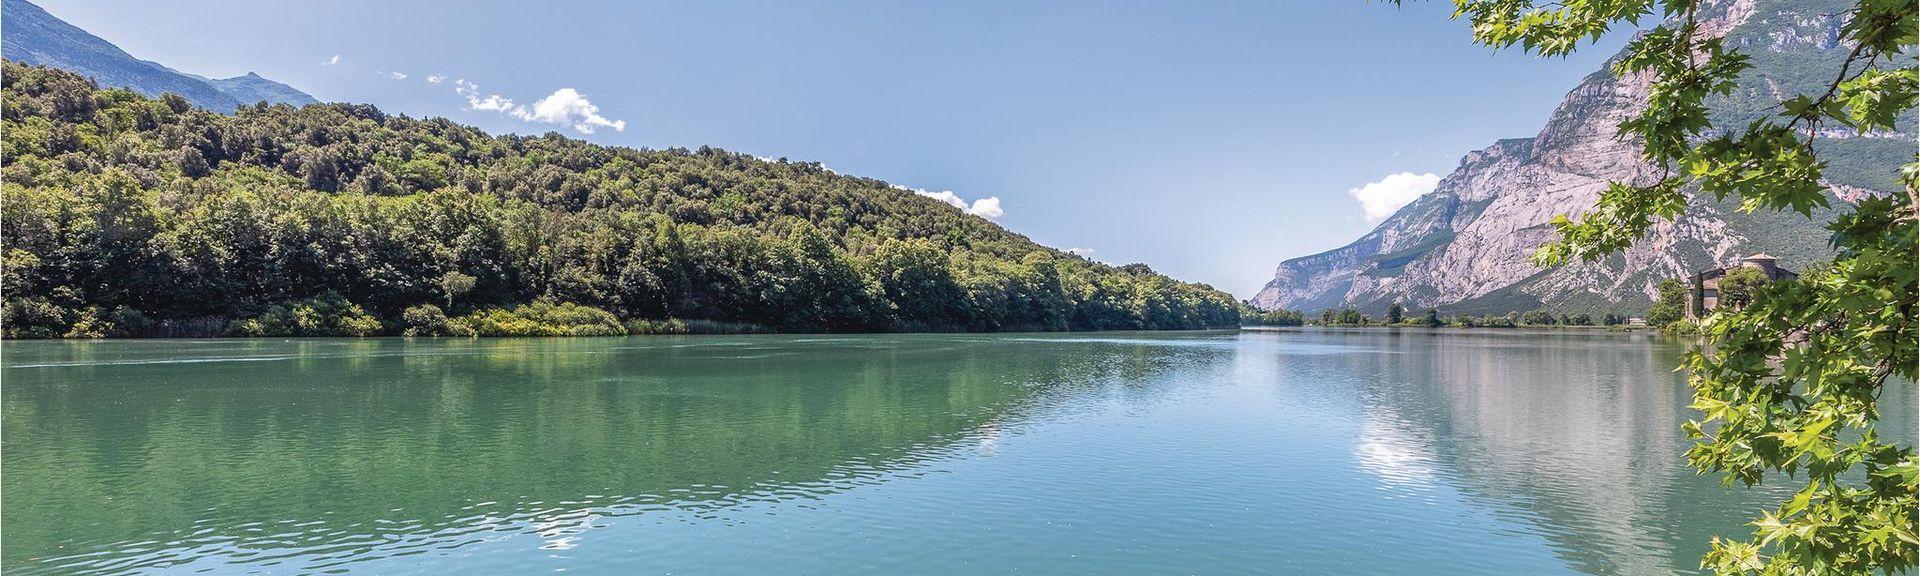 Lasino, Madruzzo, Trentin-Haut-Adige, Italie